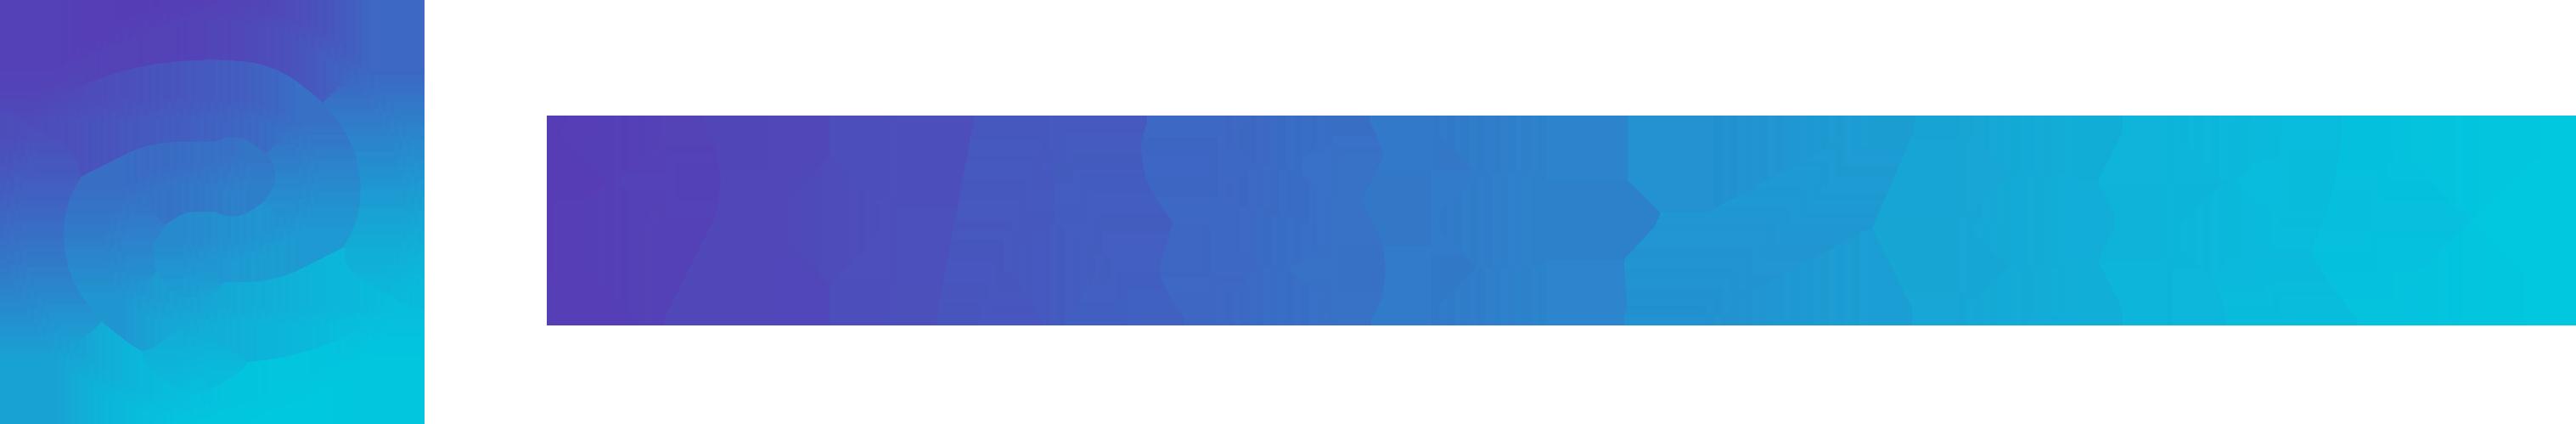 SystemFlow logo